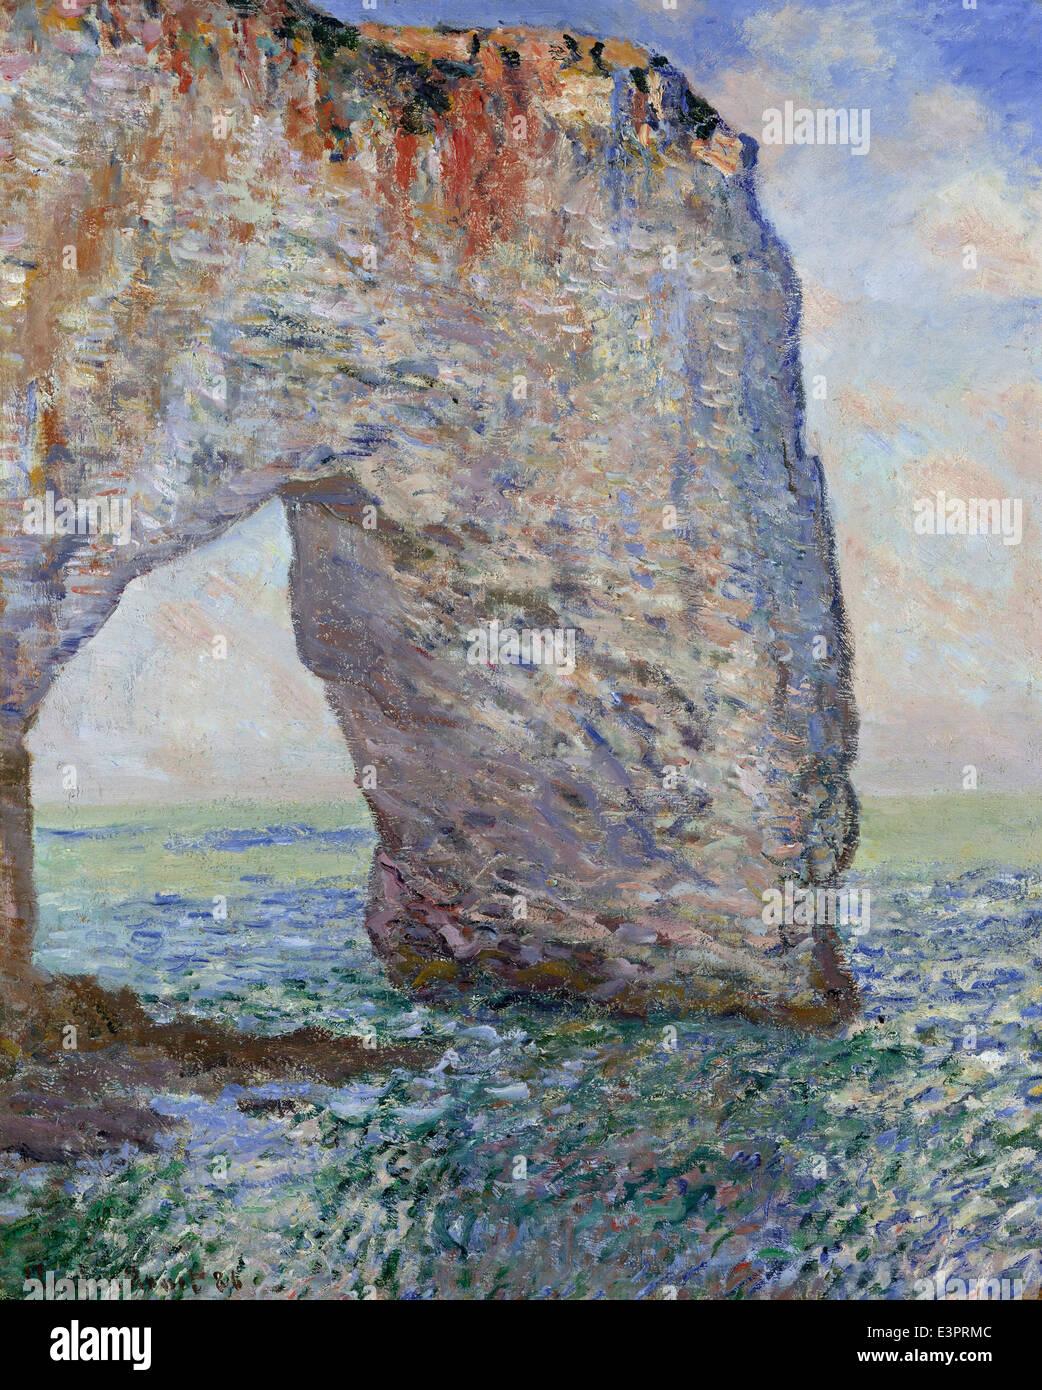 Claude Monet - The Manneporte near Étretat - 1886 - MET Museum - New-York - Stock Image